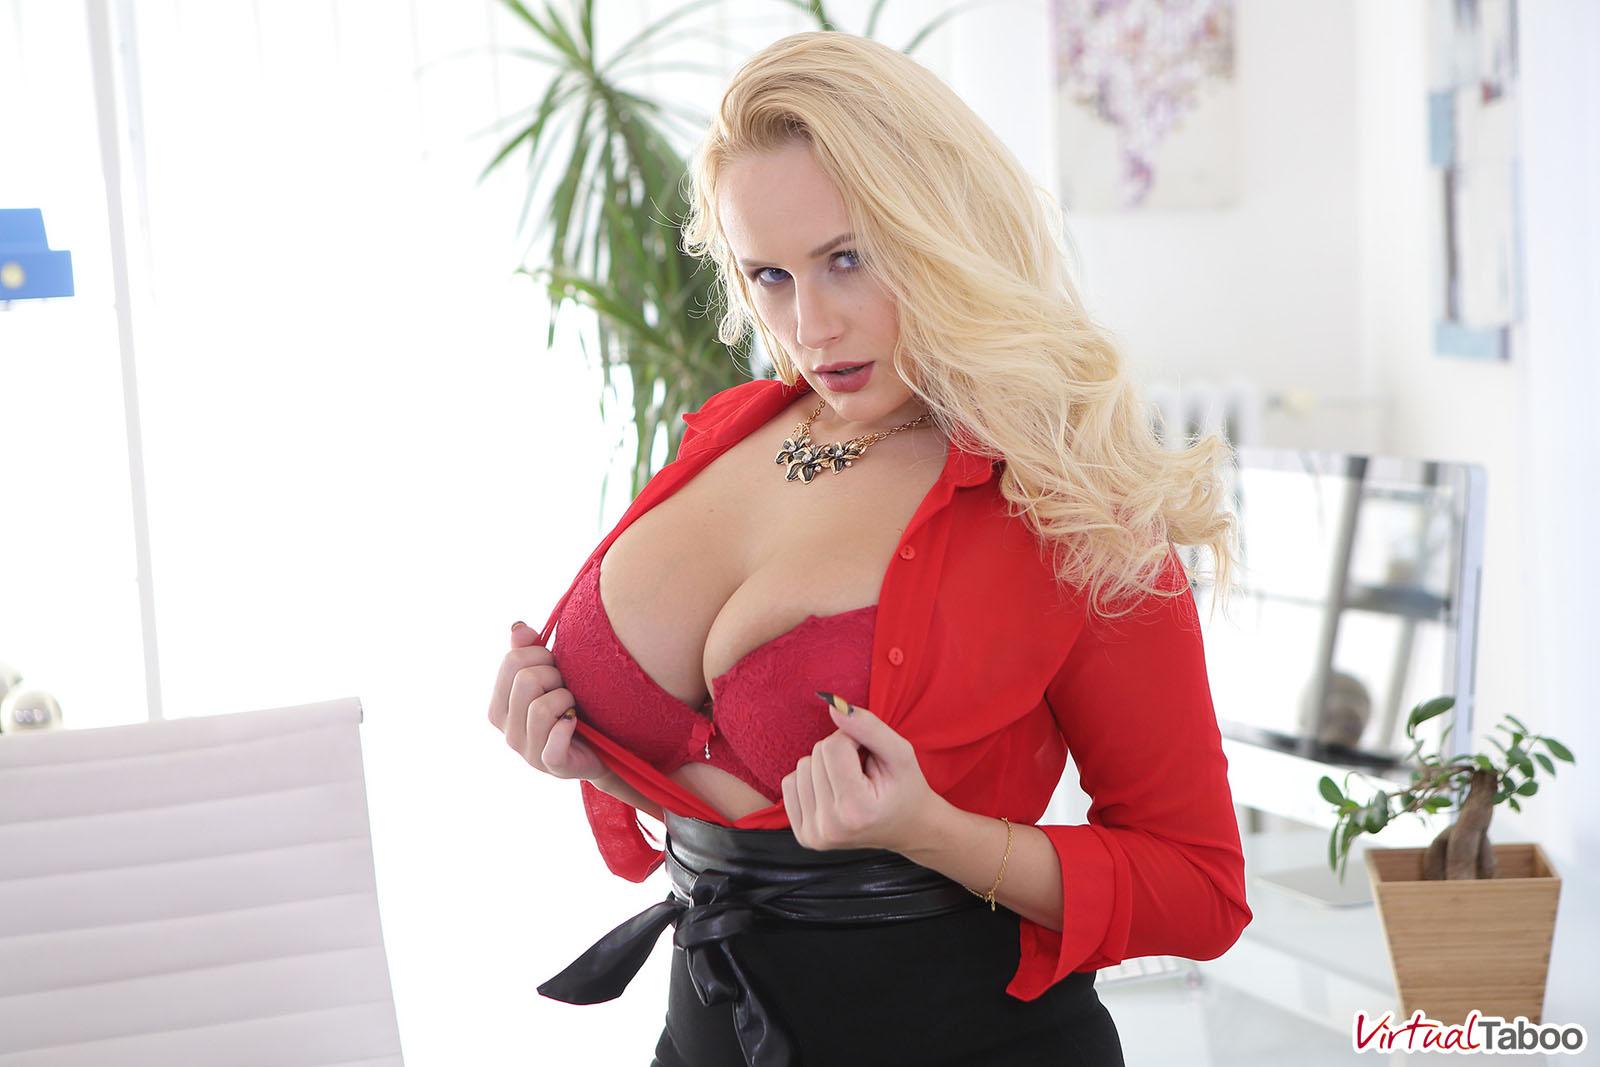 Angel Wicky Sexy Busty CEO Virtual Taboo - Curvy Erotic